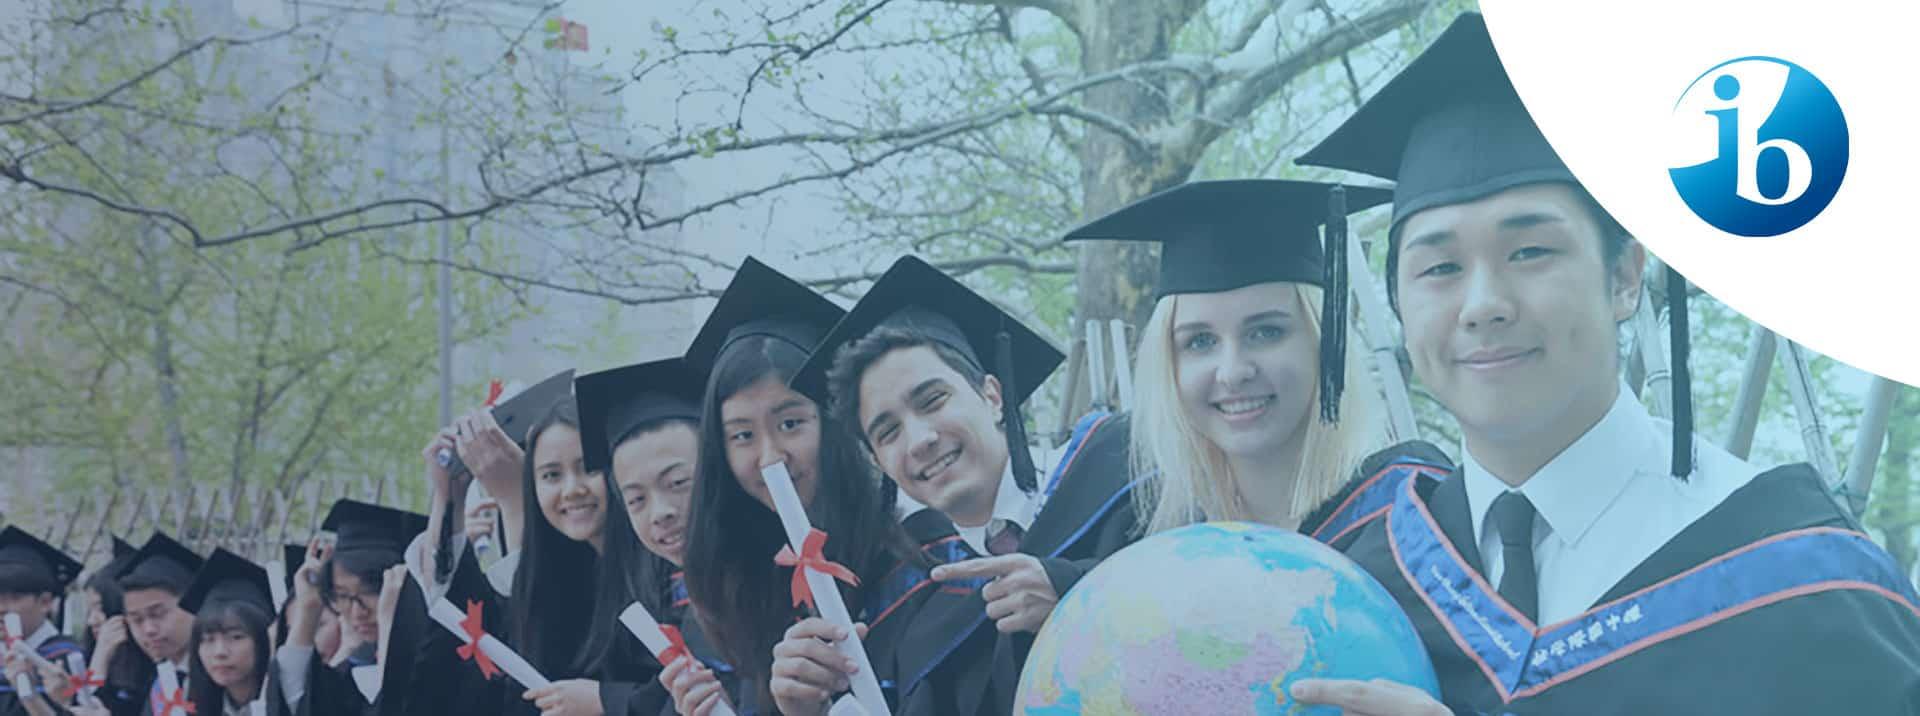 IB-diploma programme - ibdp